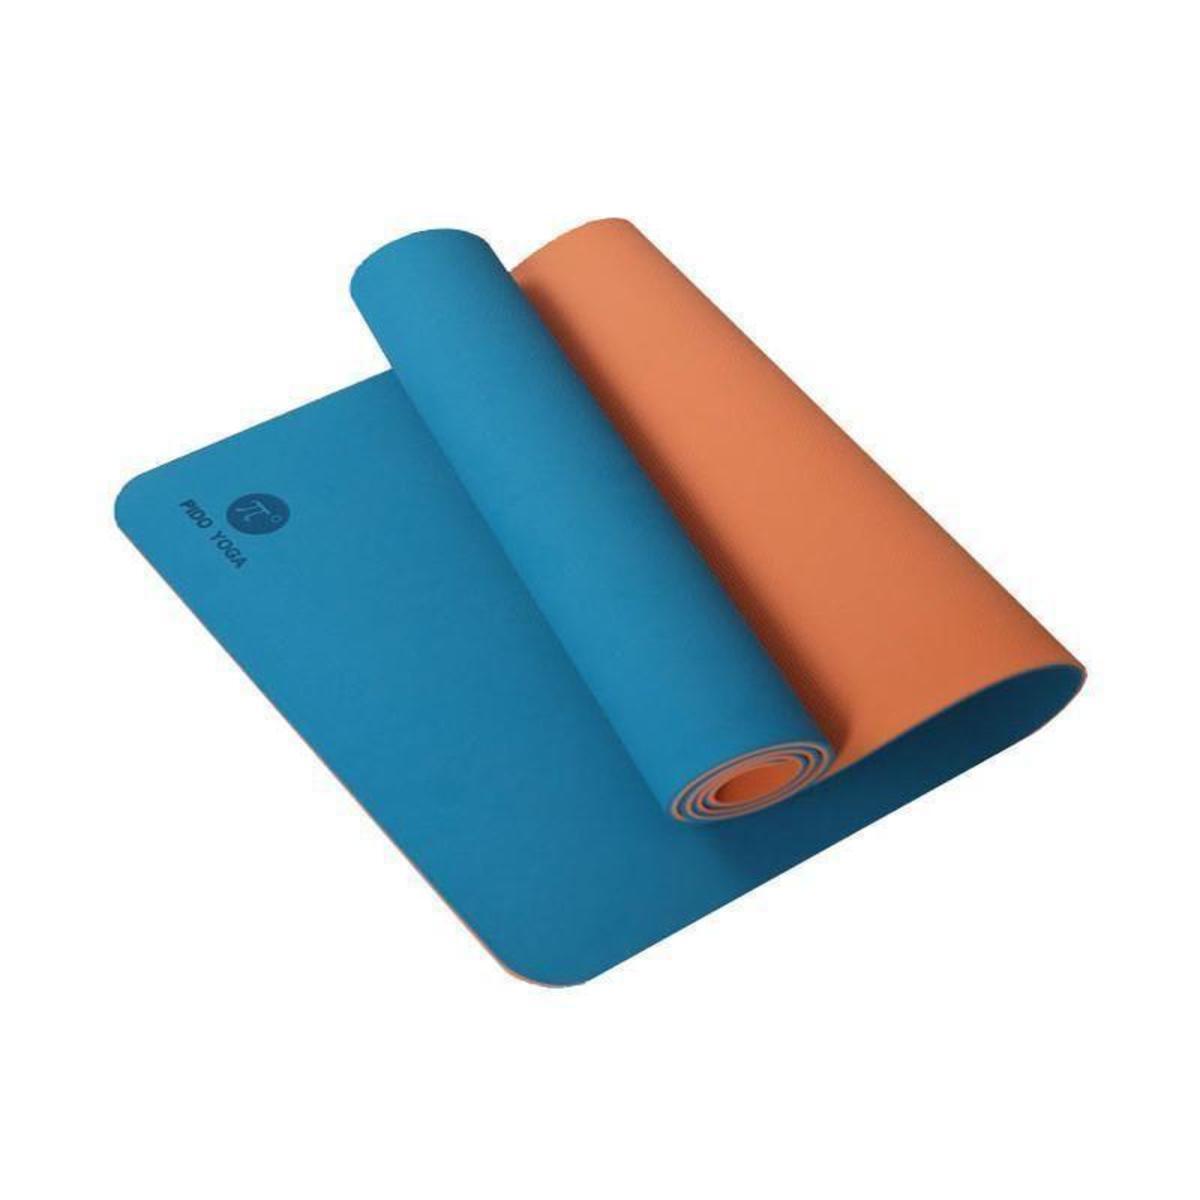 PIDO-01 6mm防滑瑜珈墊 (4款) 連收納袋+綁帶 - 淺藍色/橙色